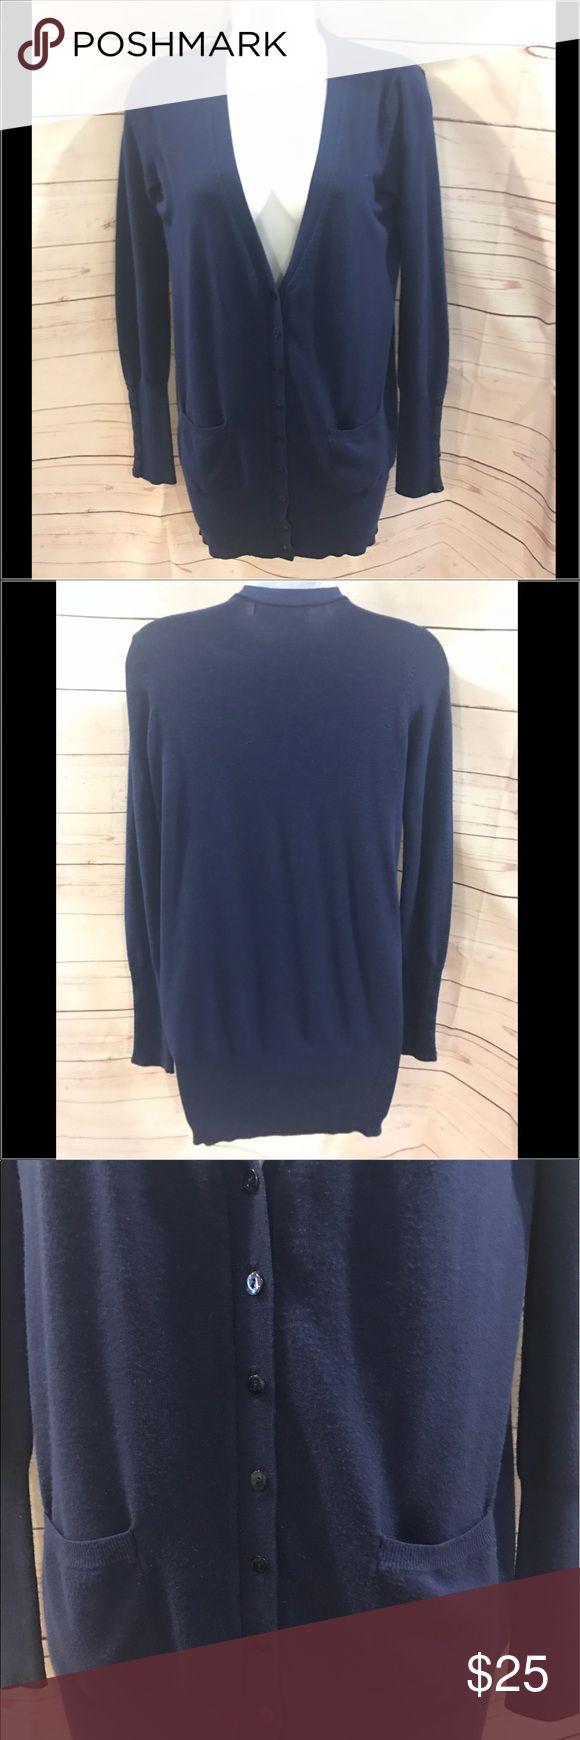 "Zara cardigan Zara cardigan.  Royal blue button down cardigan.  Bottoms on sides of arms, 2 front pockets.  Rayon/nylon/elastane. EUC. No flaws.  28"" long, 17"" across chest.  Item #1502 Zara Sweaters Cardigans"